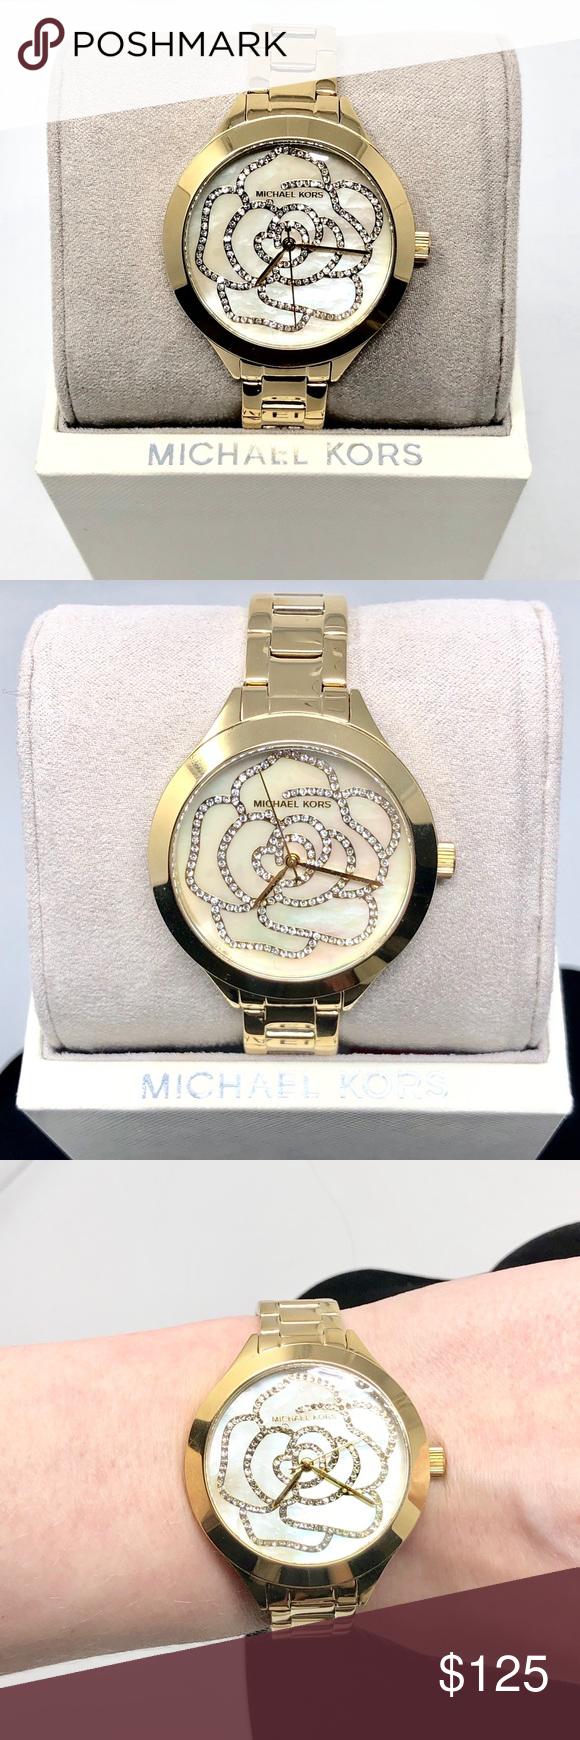 Michael Kors Gold Tone Watch NWT MK3992 This Michael Kors